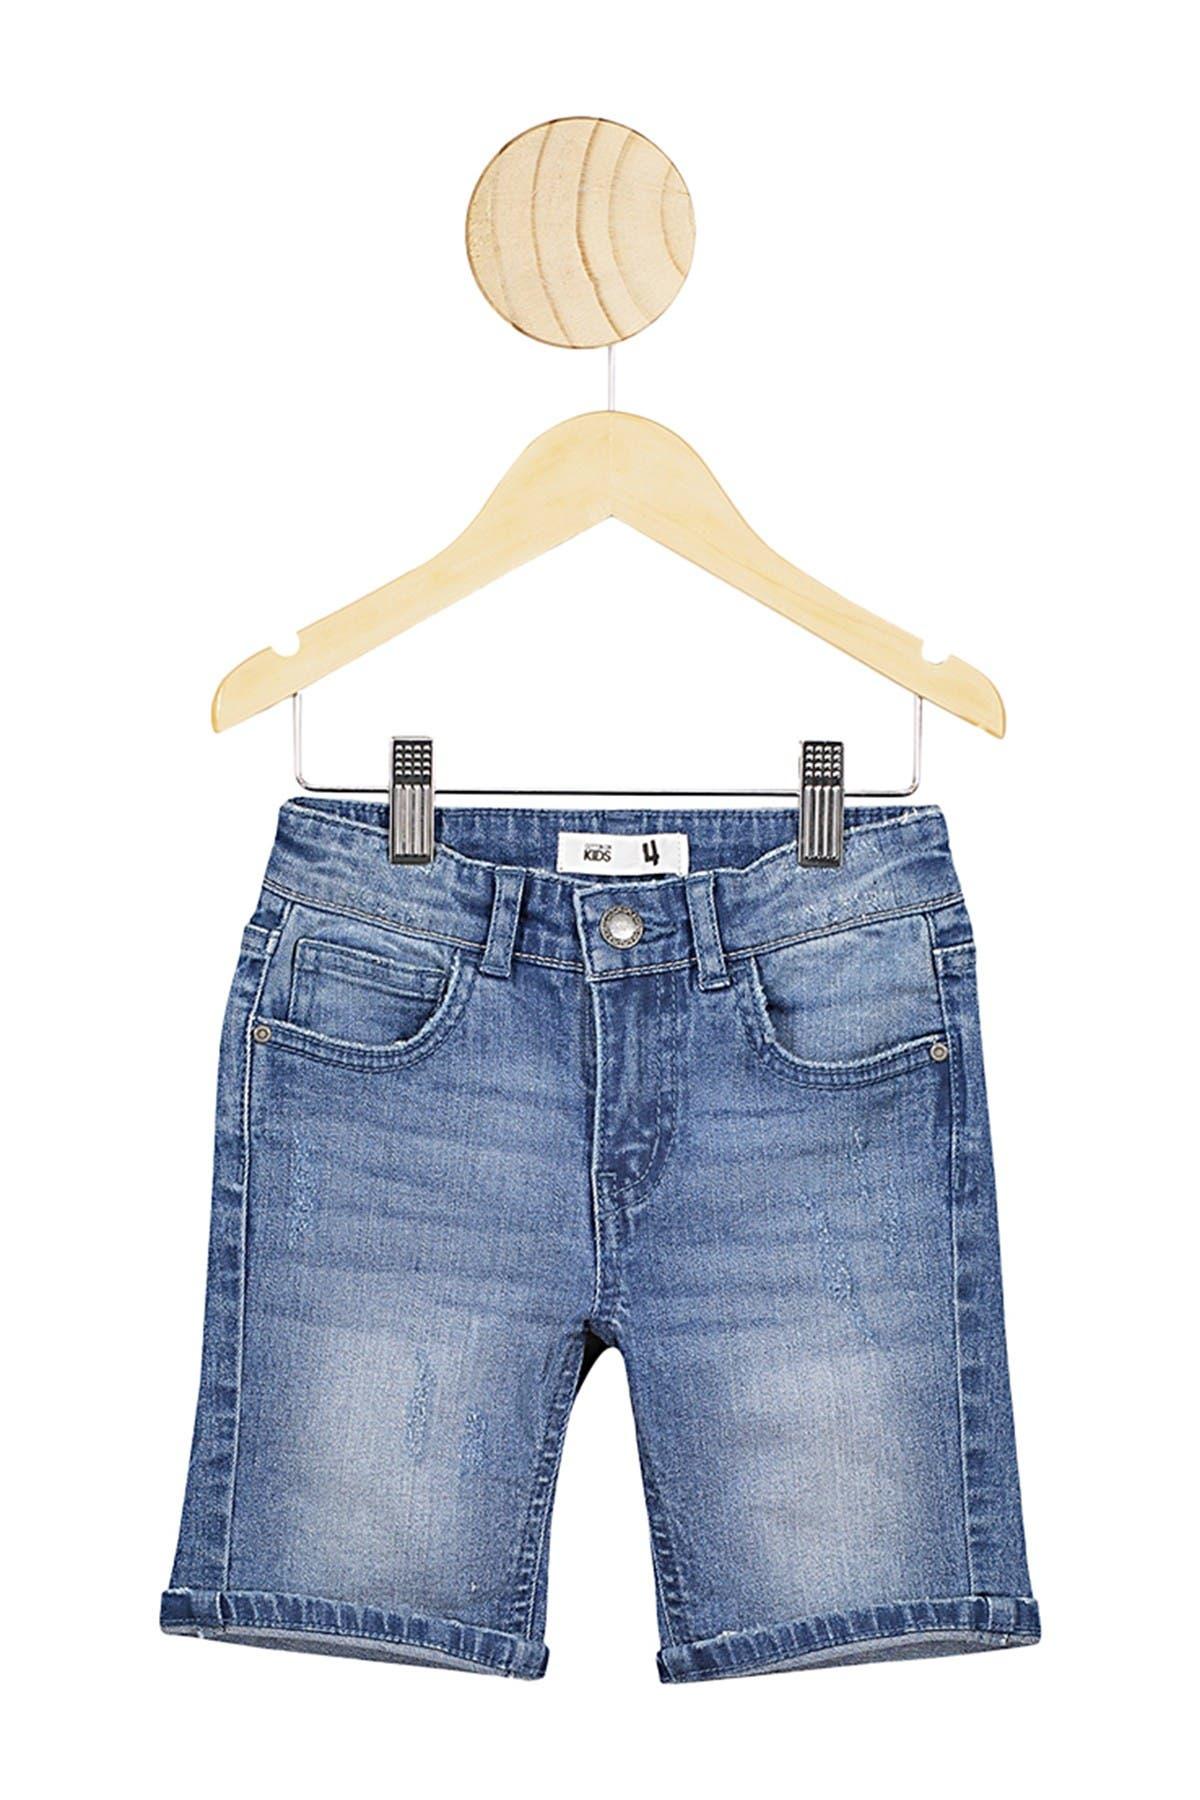 Cotton On Bermuda Denim Shorts at Nordstrom Rack